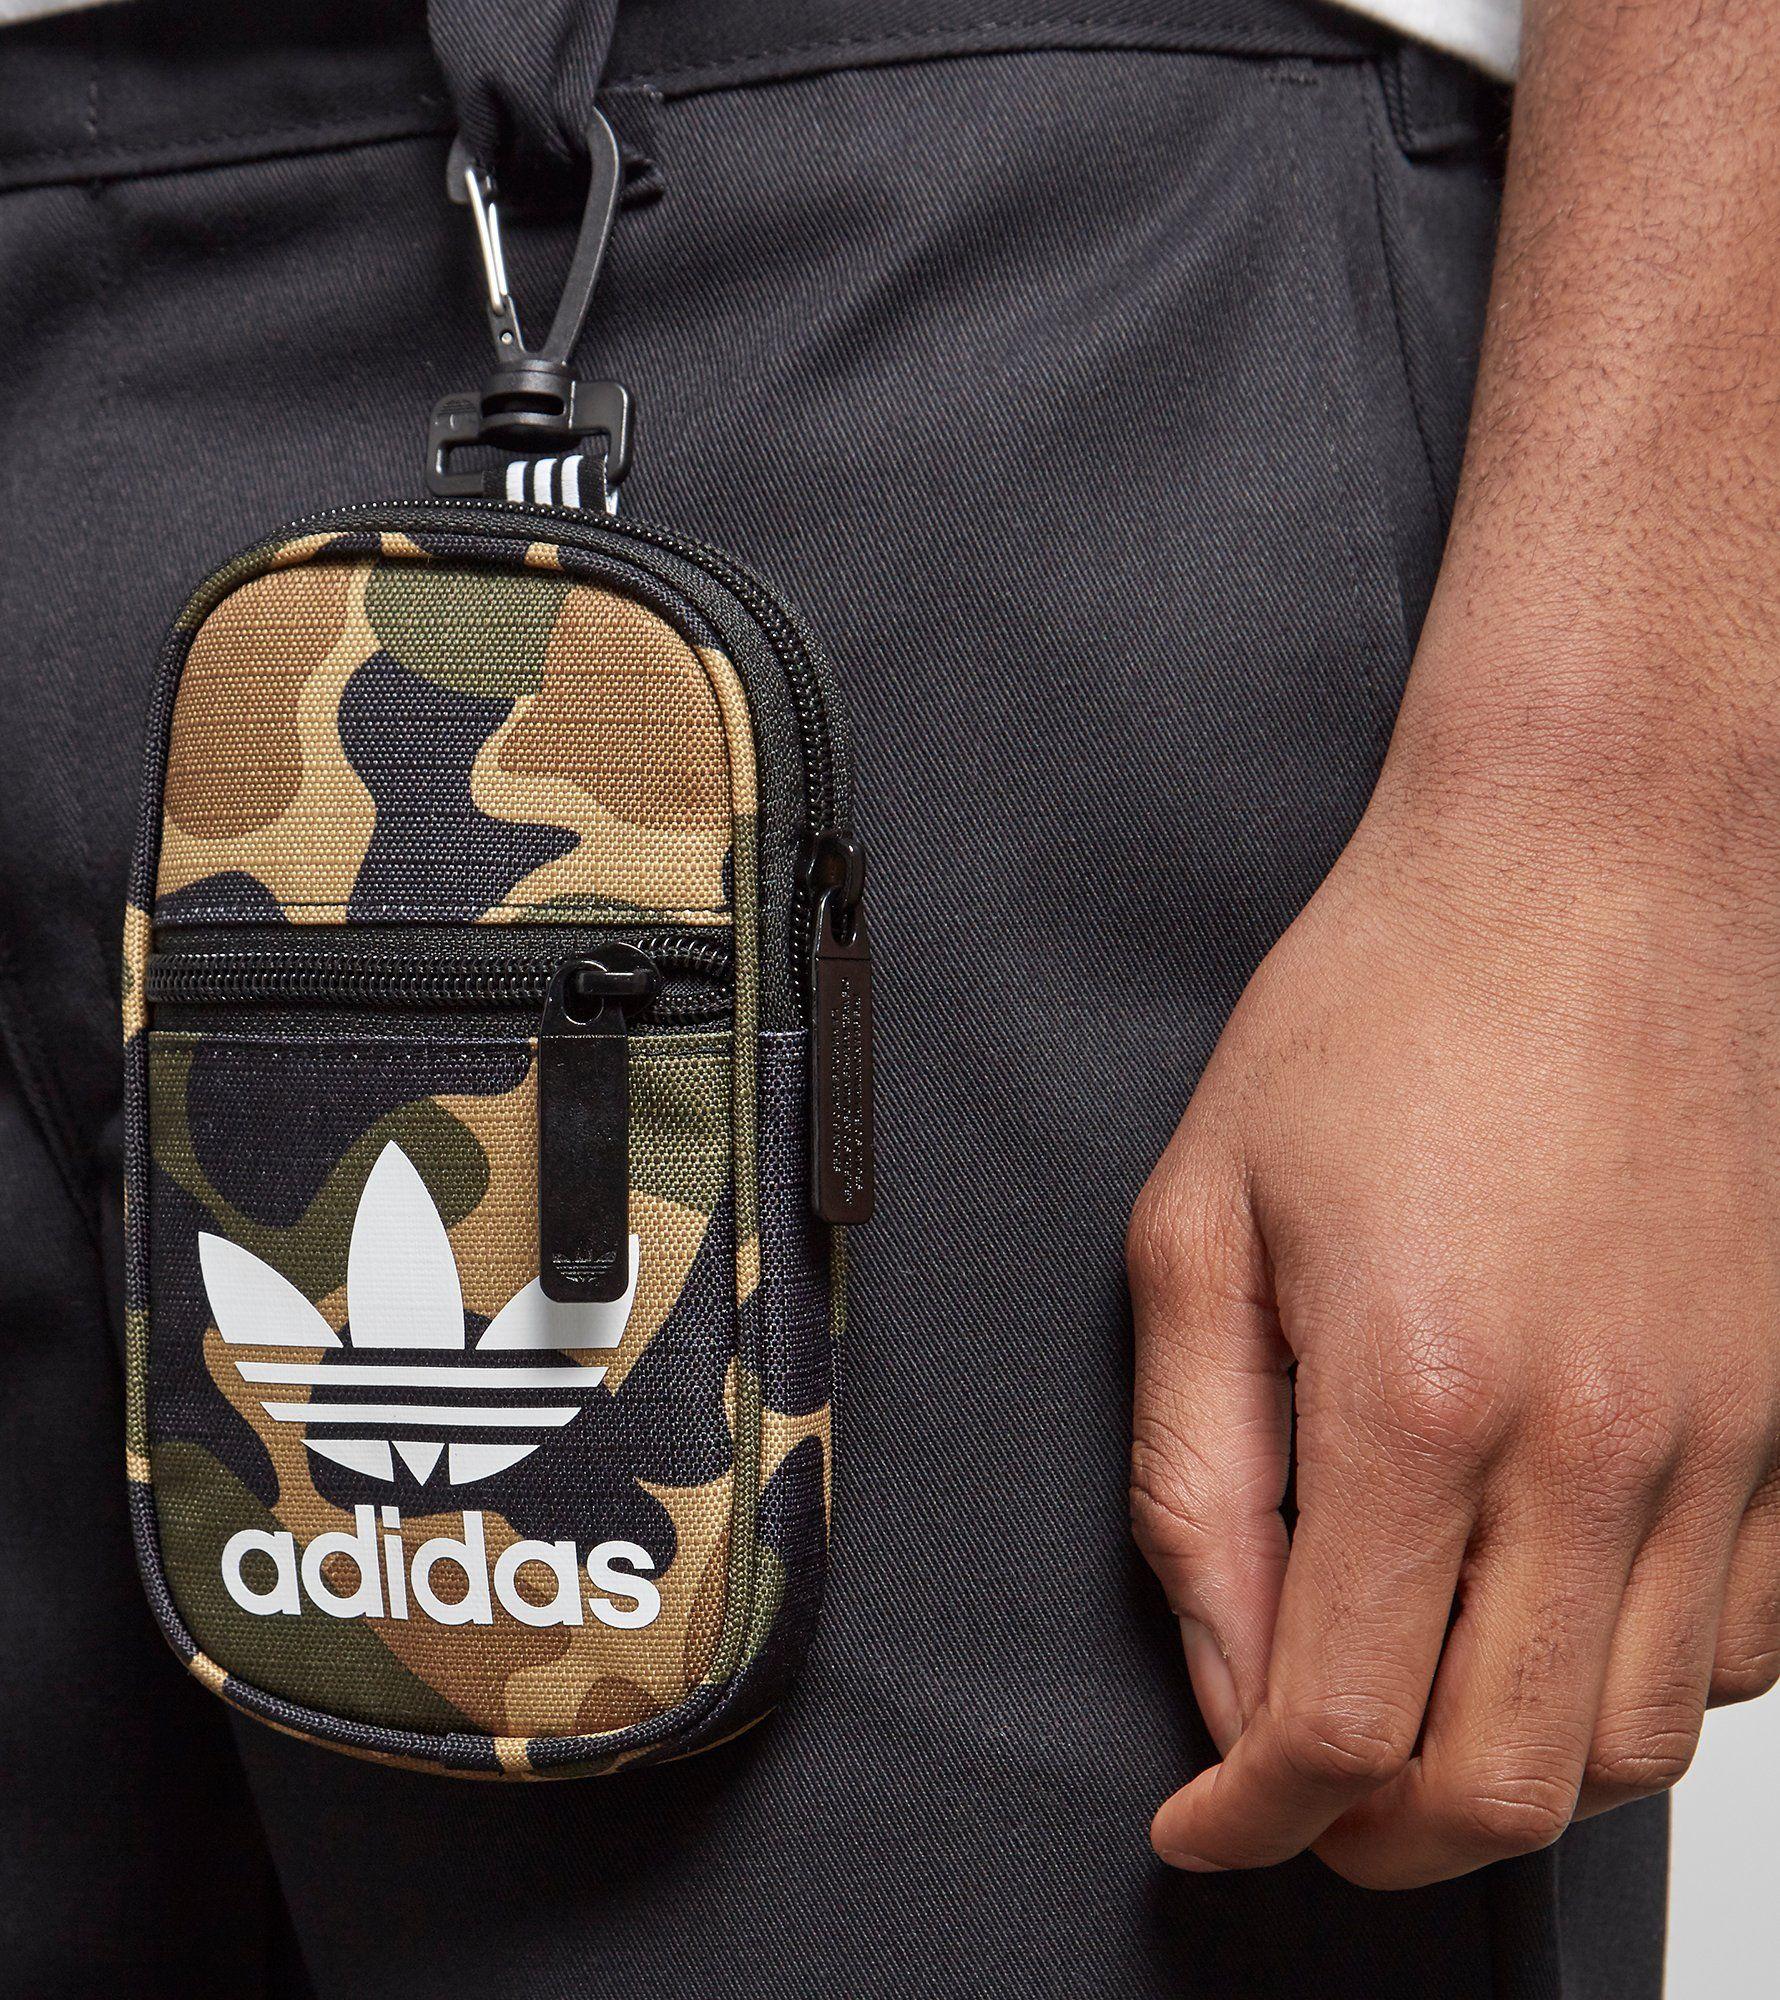 adidas Originals Trefoil Clip Pouch Bag